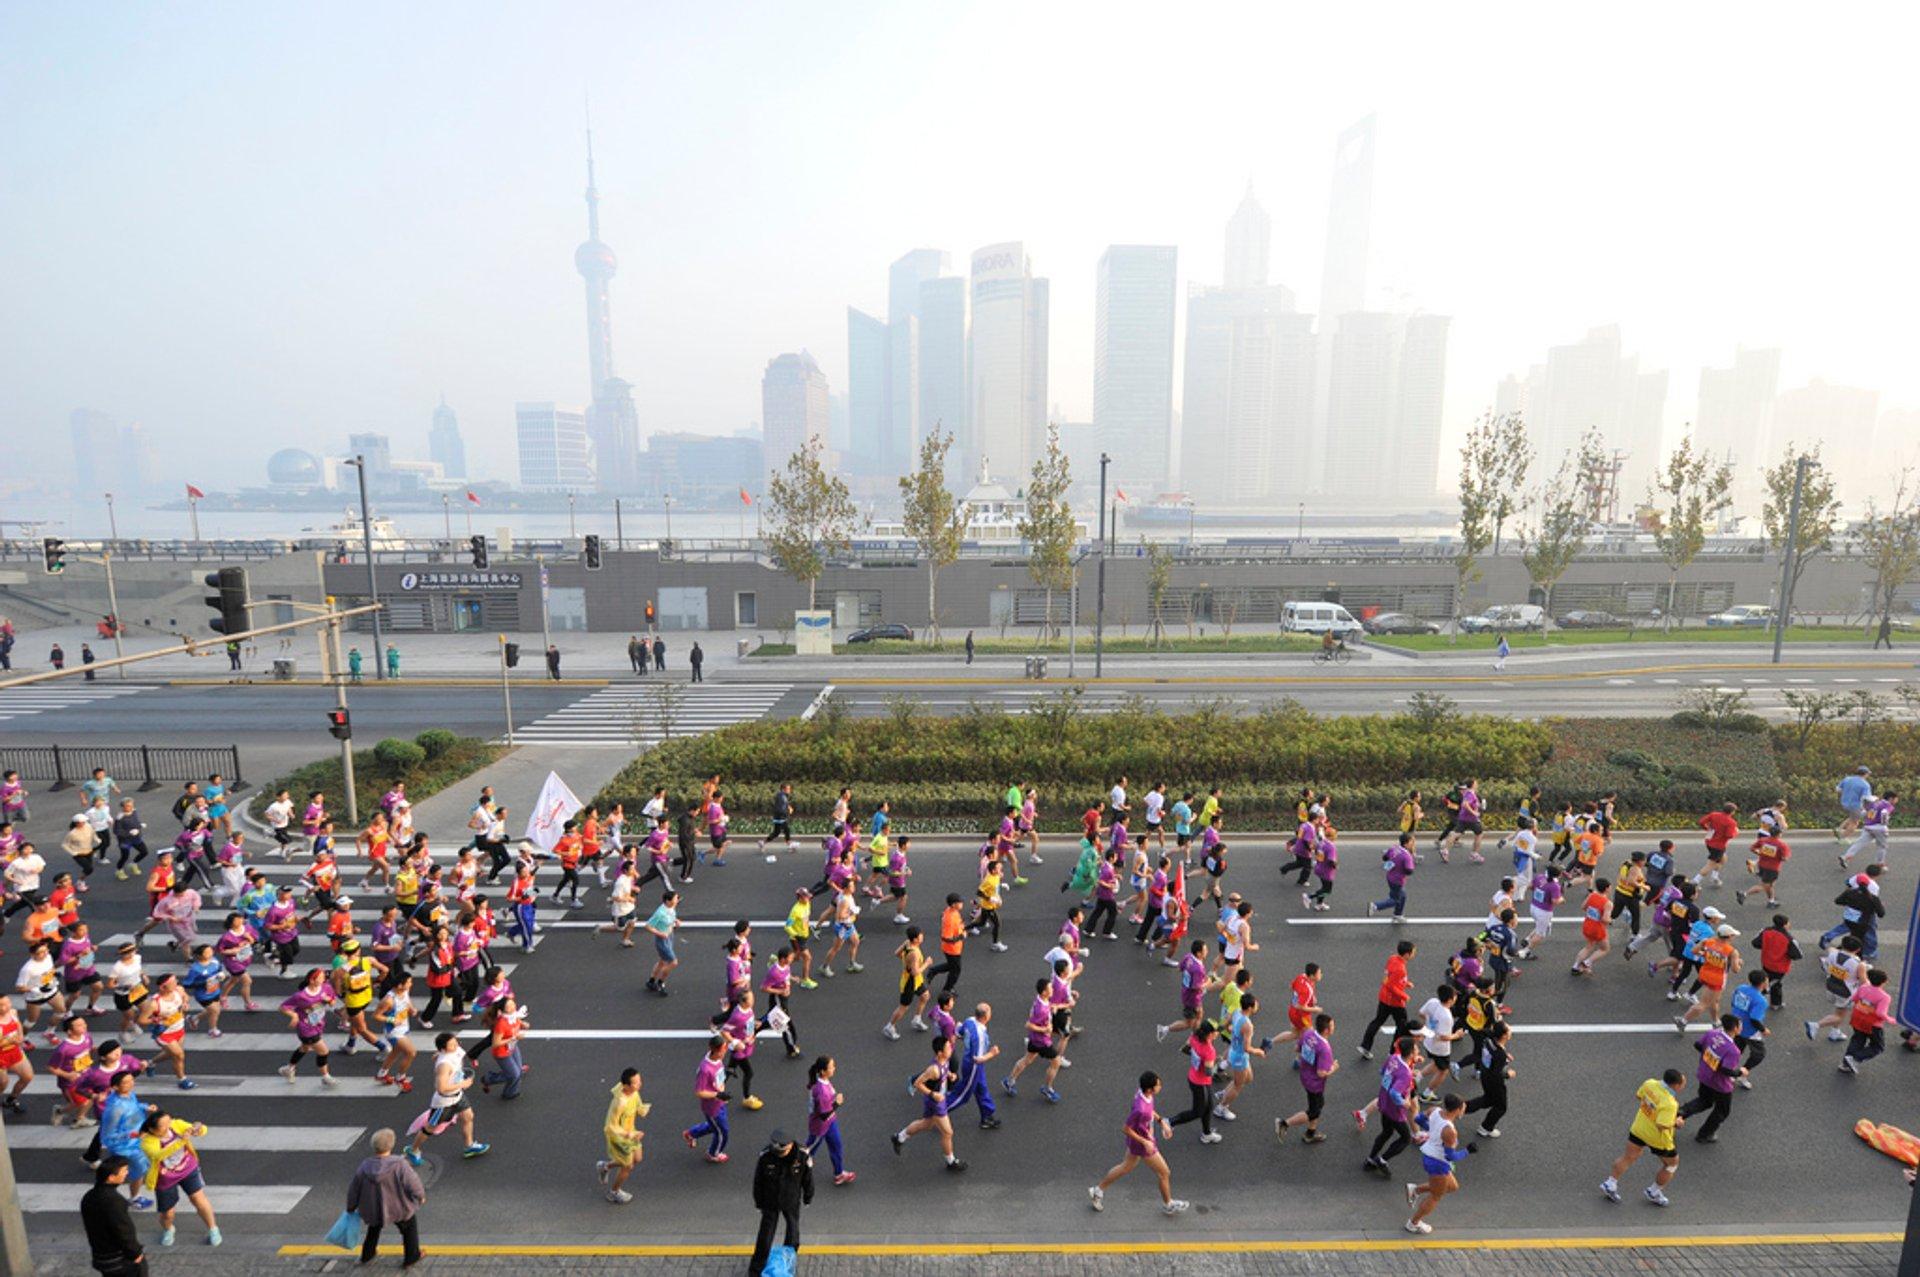 Shanghai International Marathon in Shanghai 2019 - Best Time